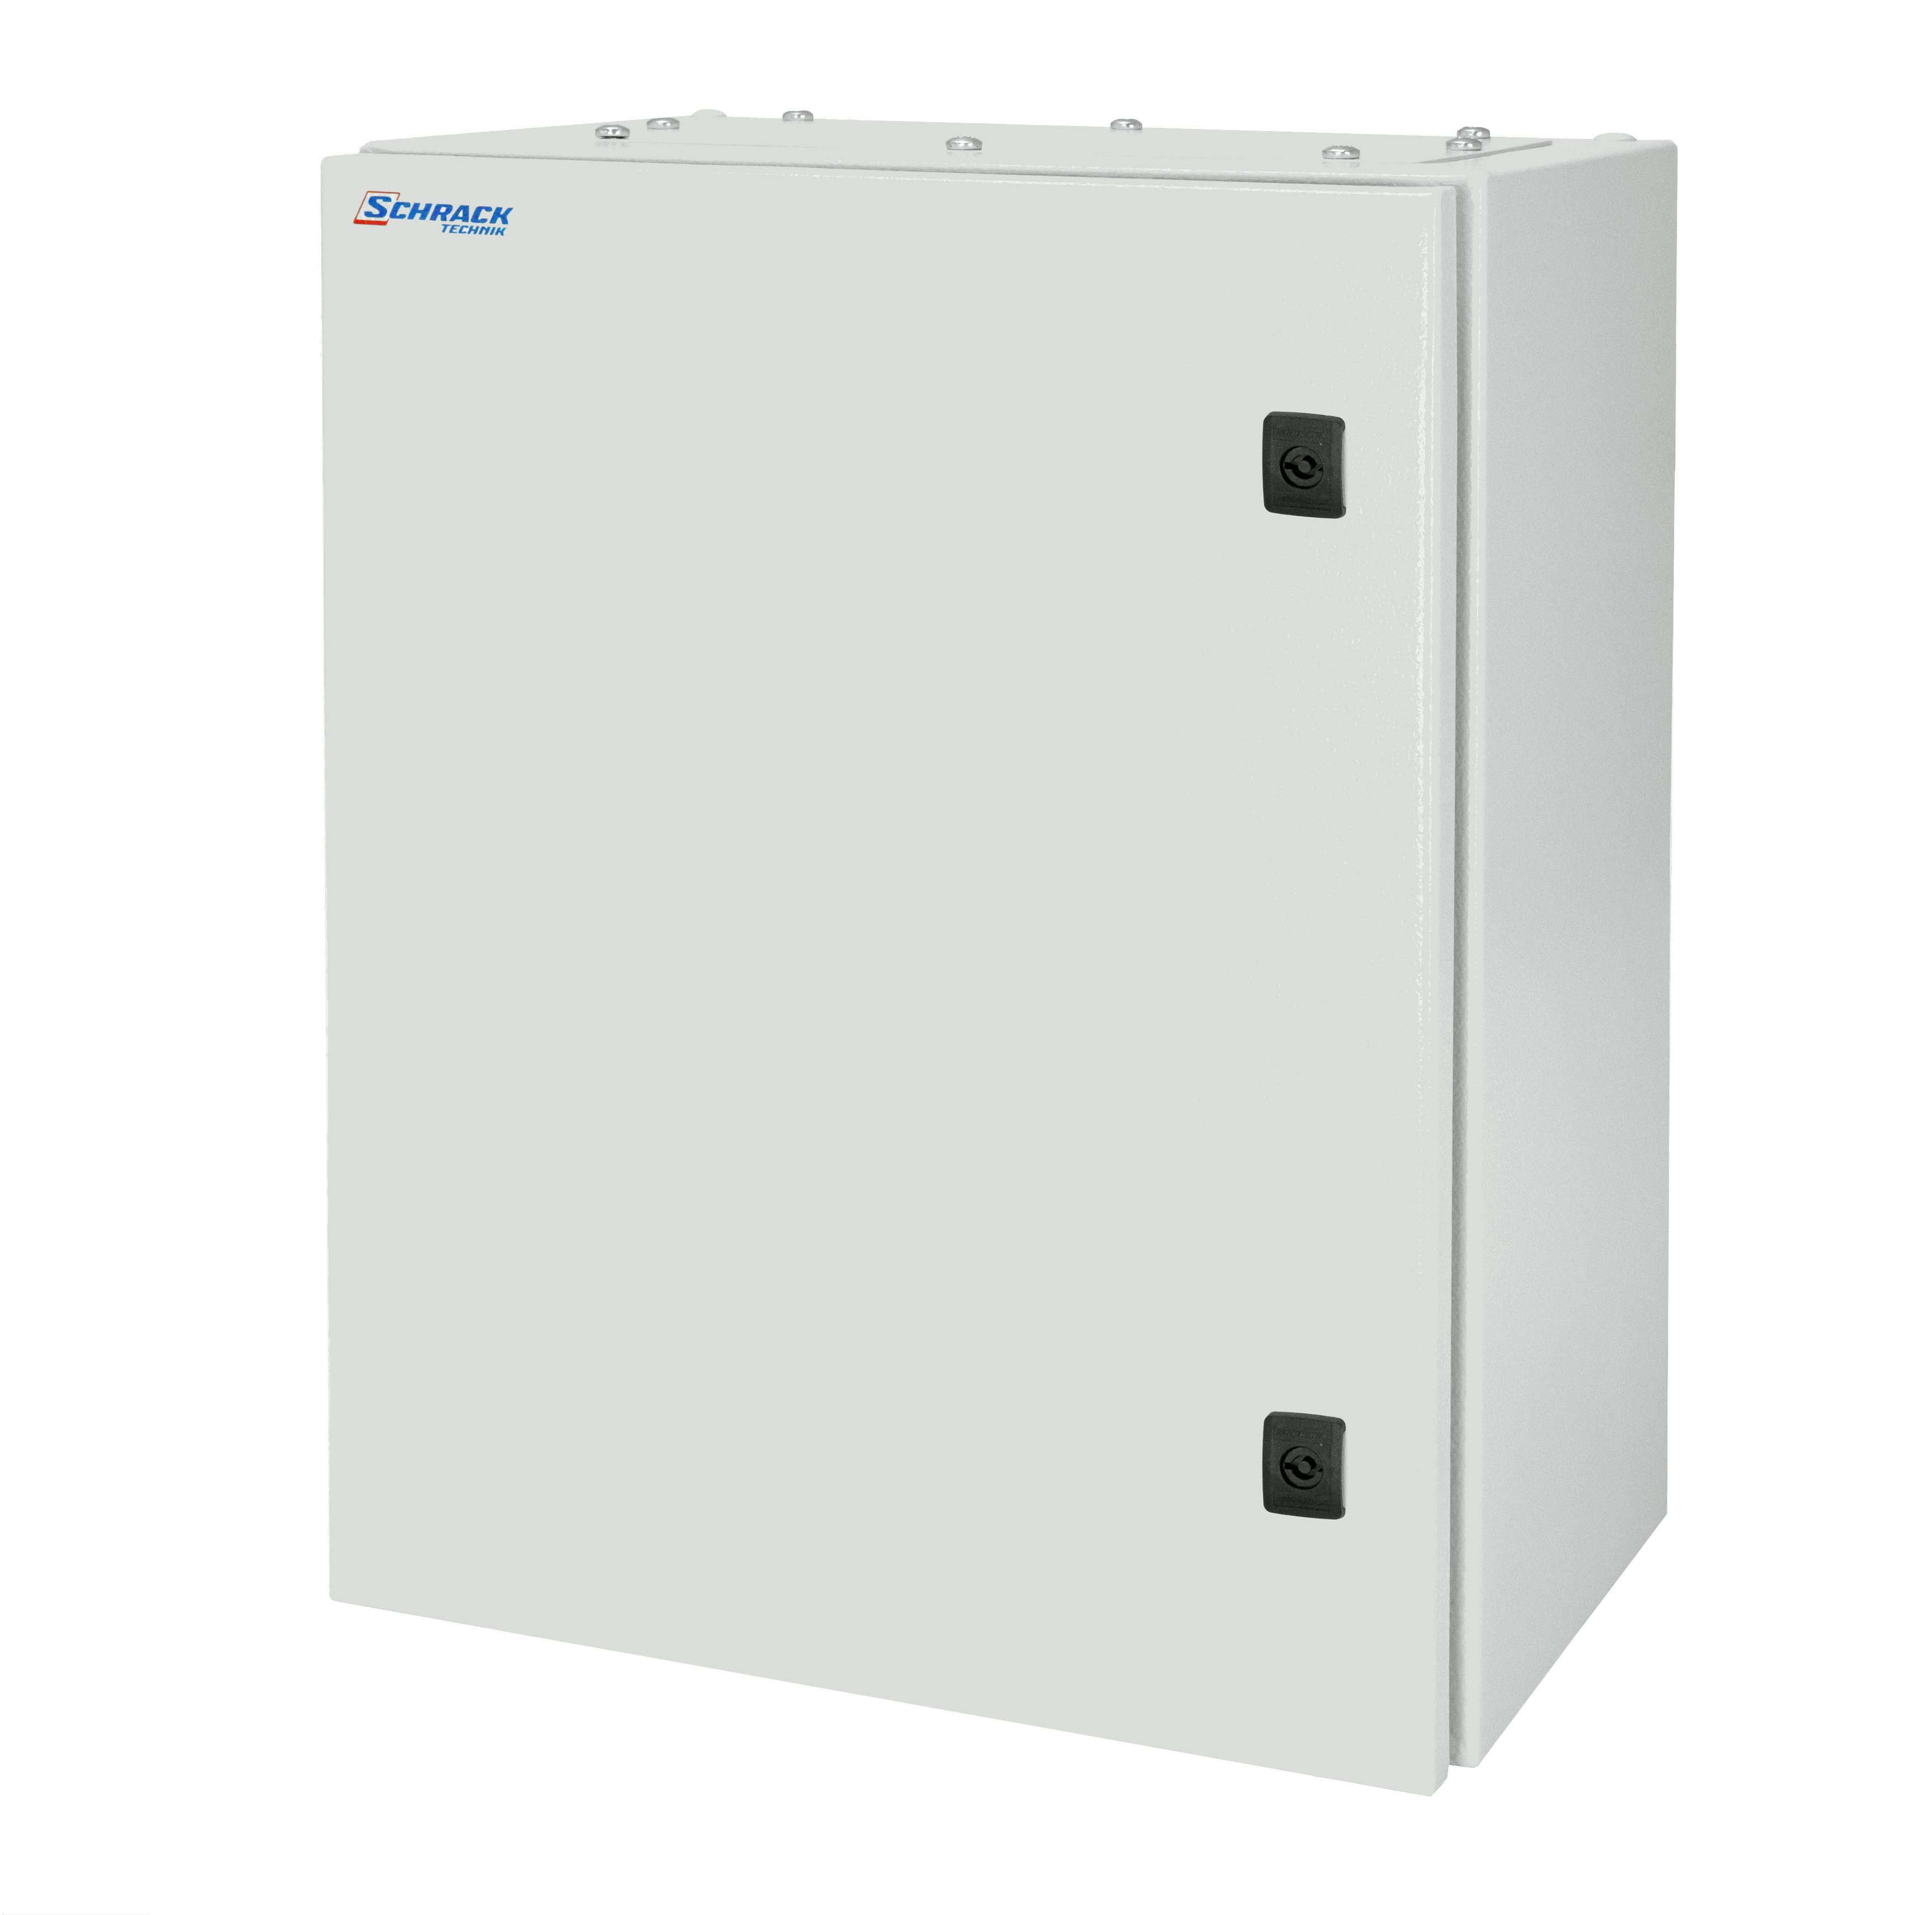 1 Stk Wandschrank Mono IP66 H=600 B=400 T=210 Stahlblech WSM6040210